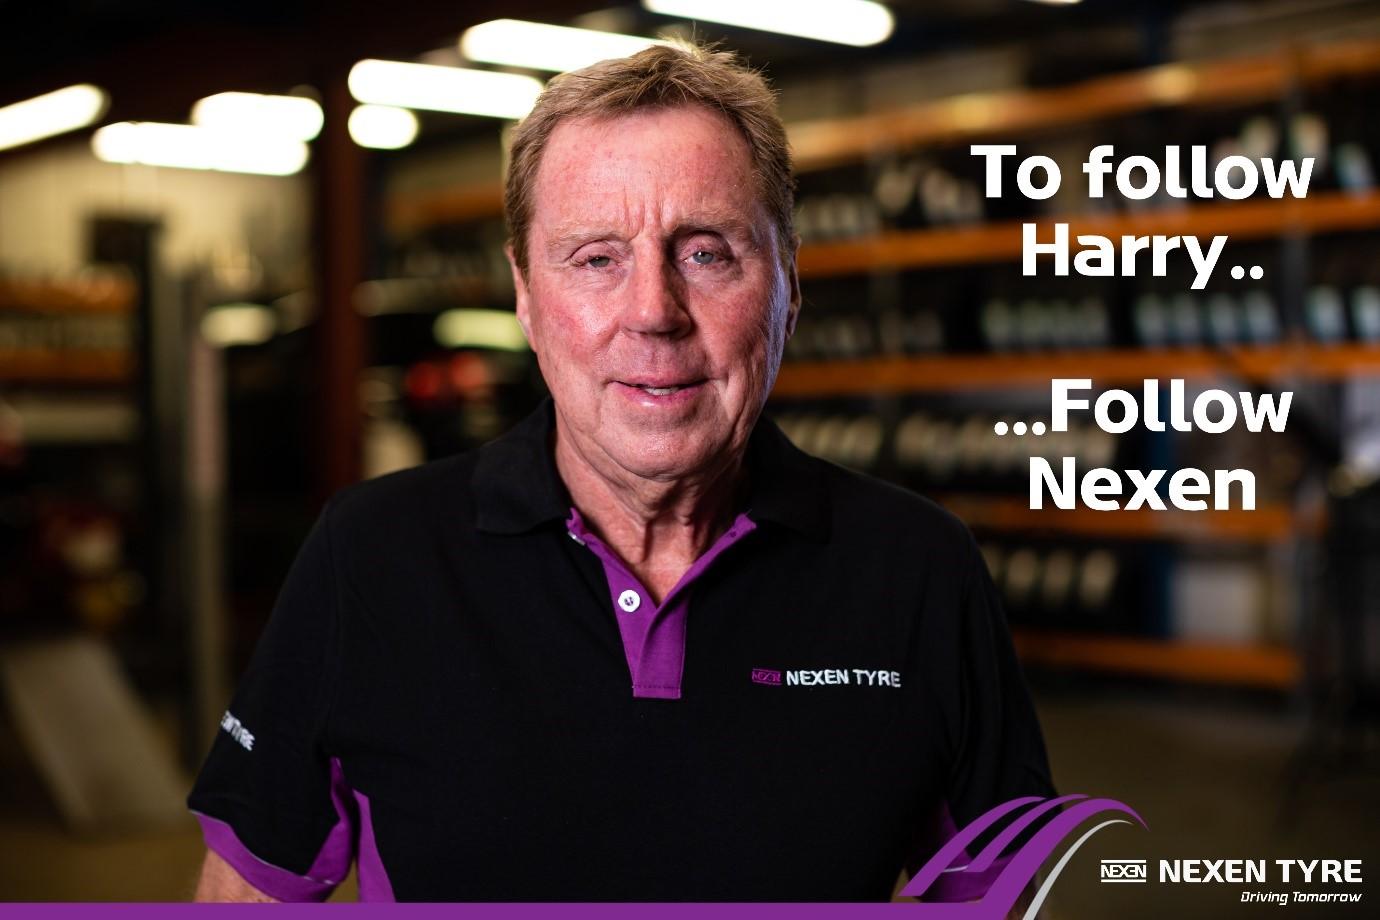 Nexen signs-up Harry Redknapp